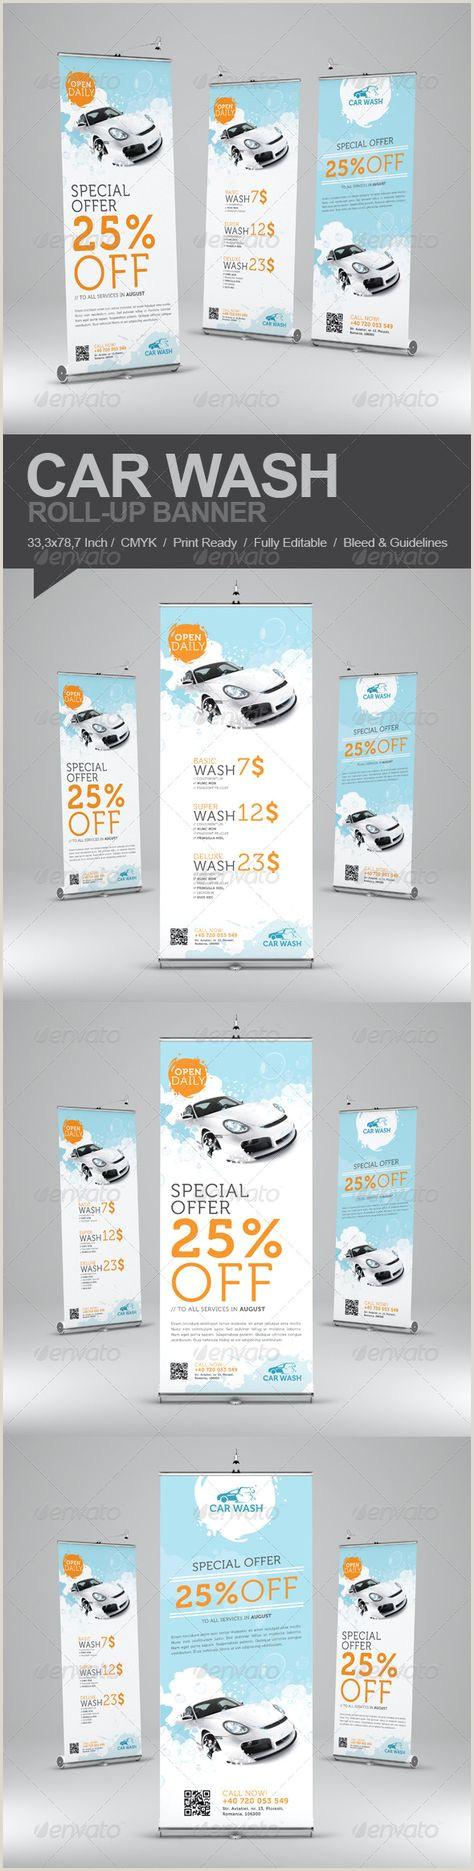 Pop Up Marketing Banners 40 Mejores Imágenes De Roll Up Banner